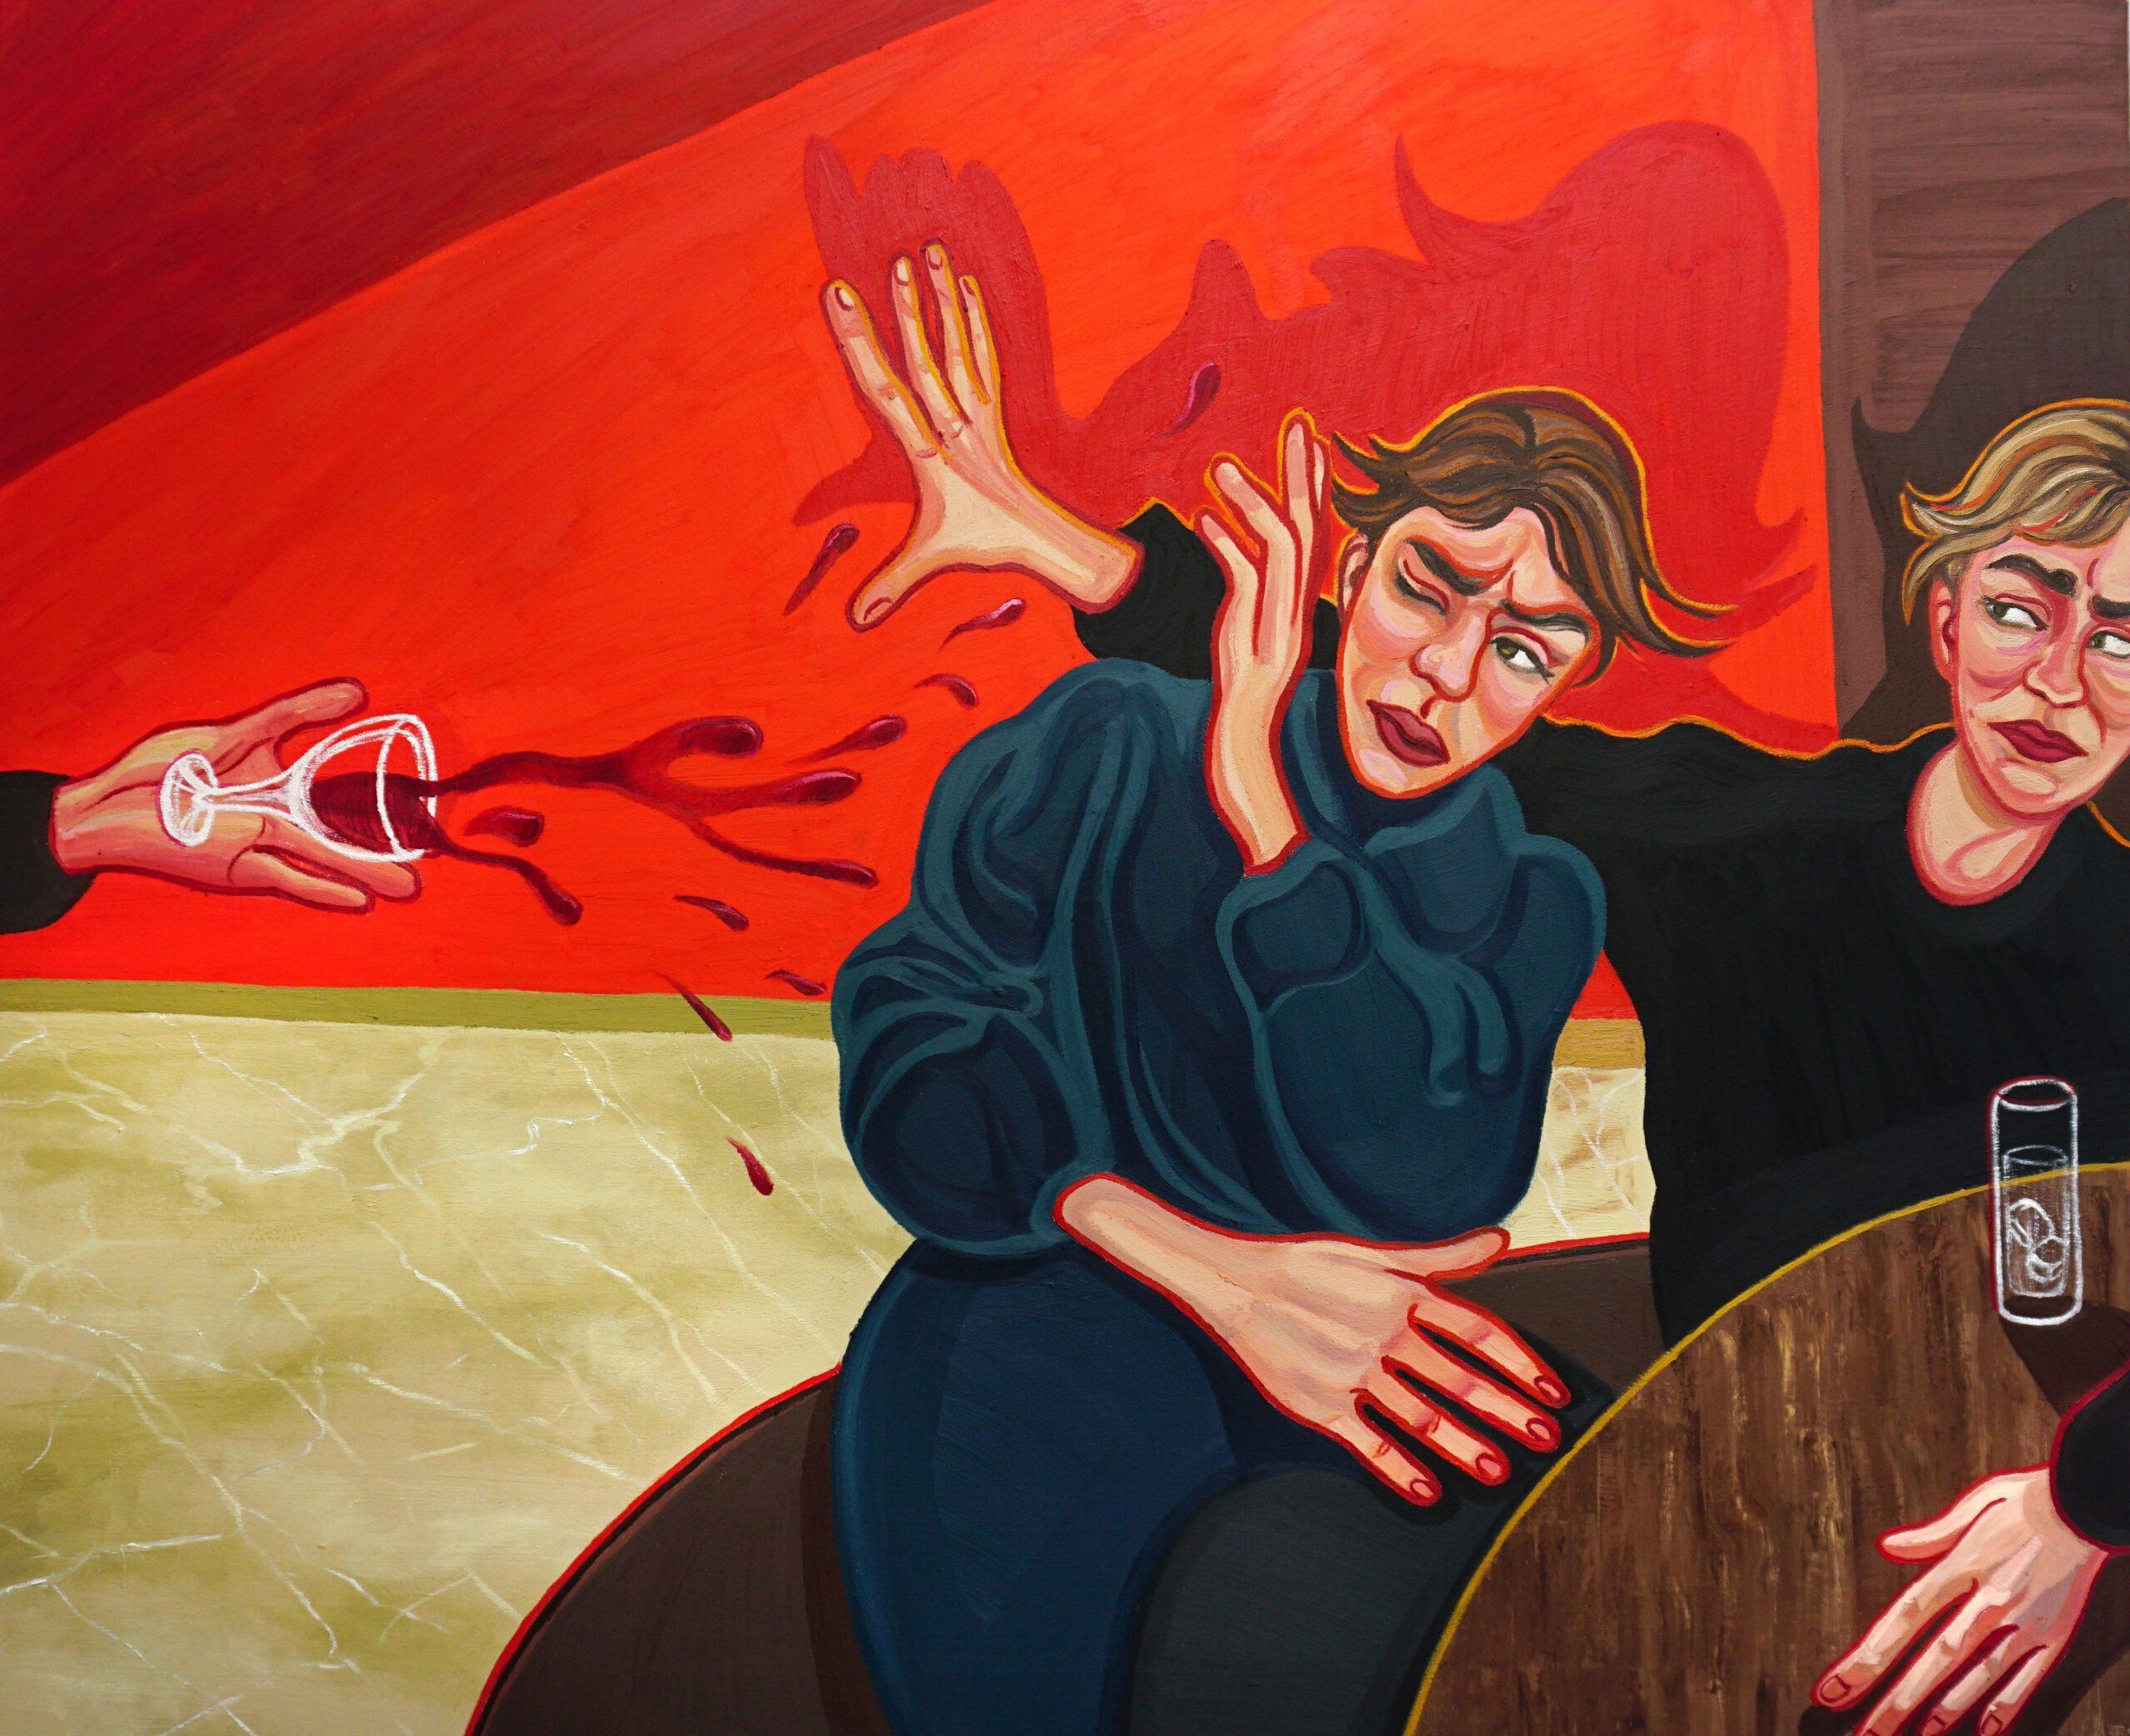 Chucking Drink, 2021, 140 x 130 cm, oil on canvas